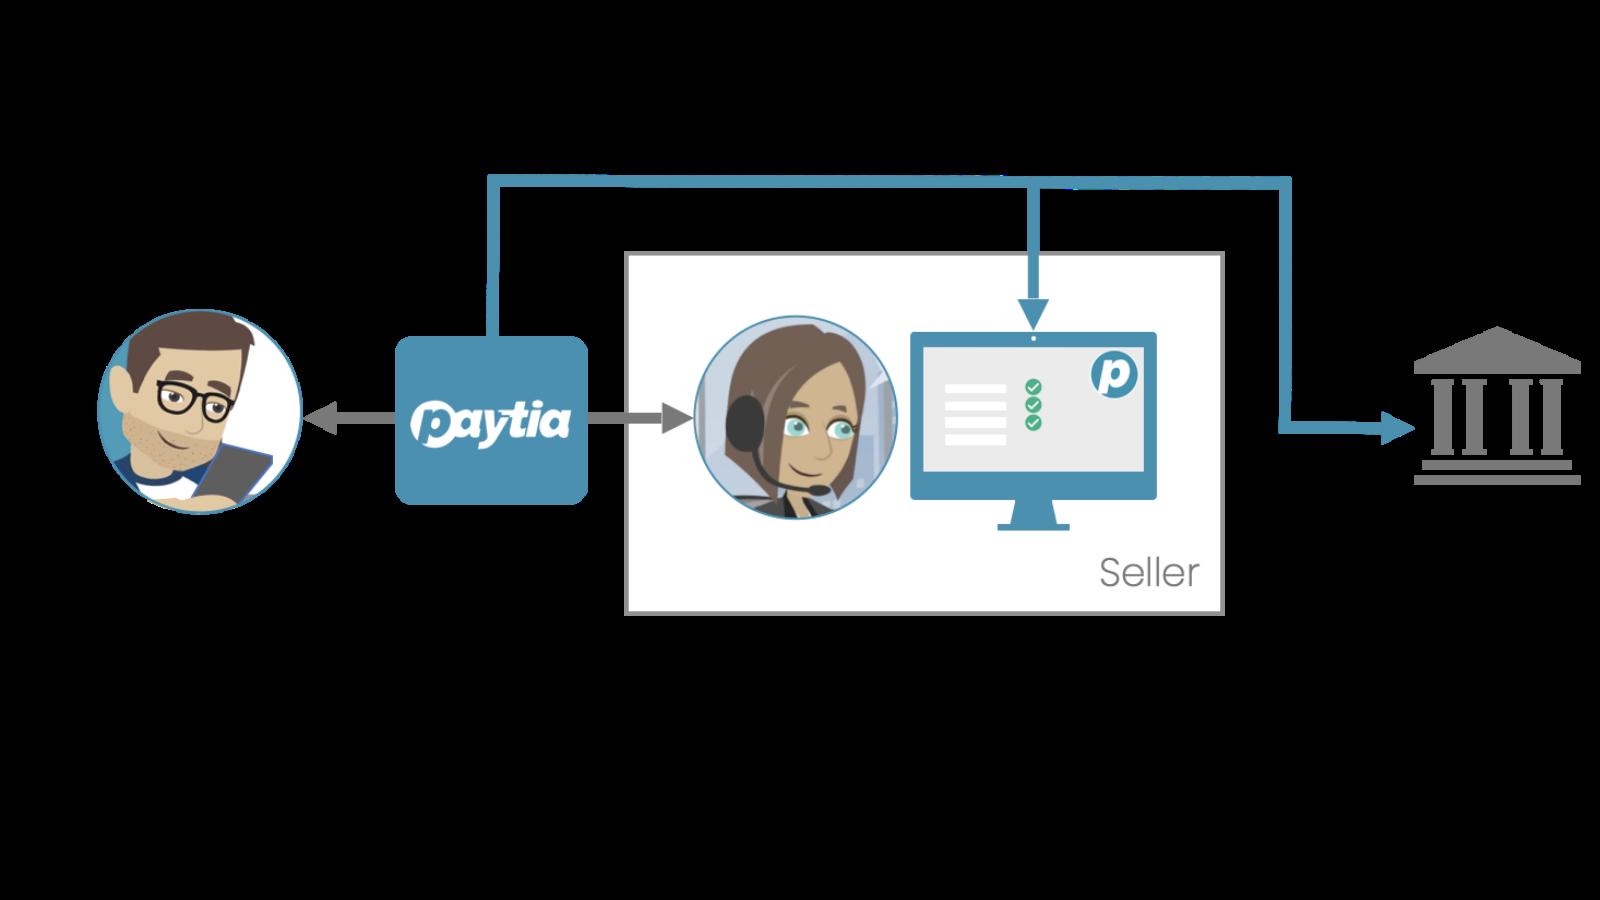 How Paytia works